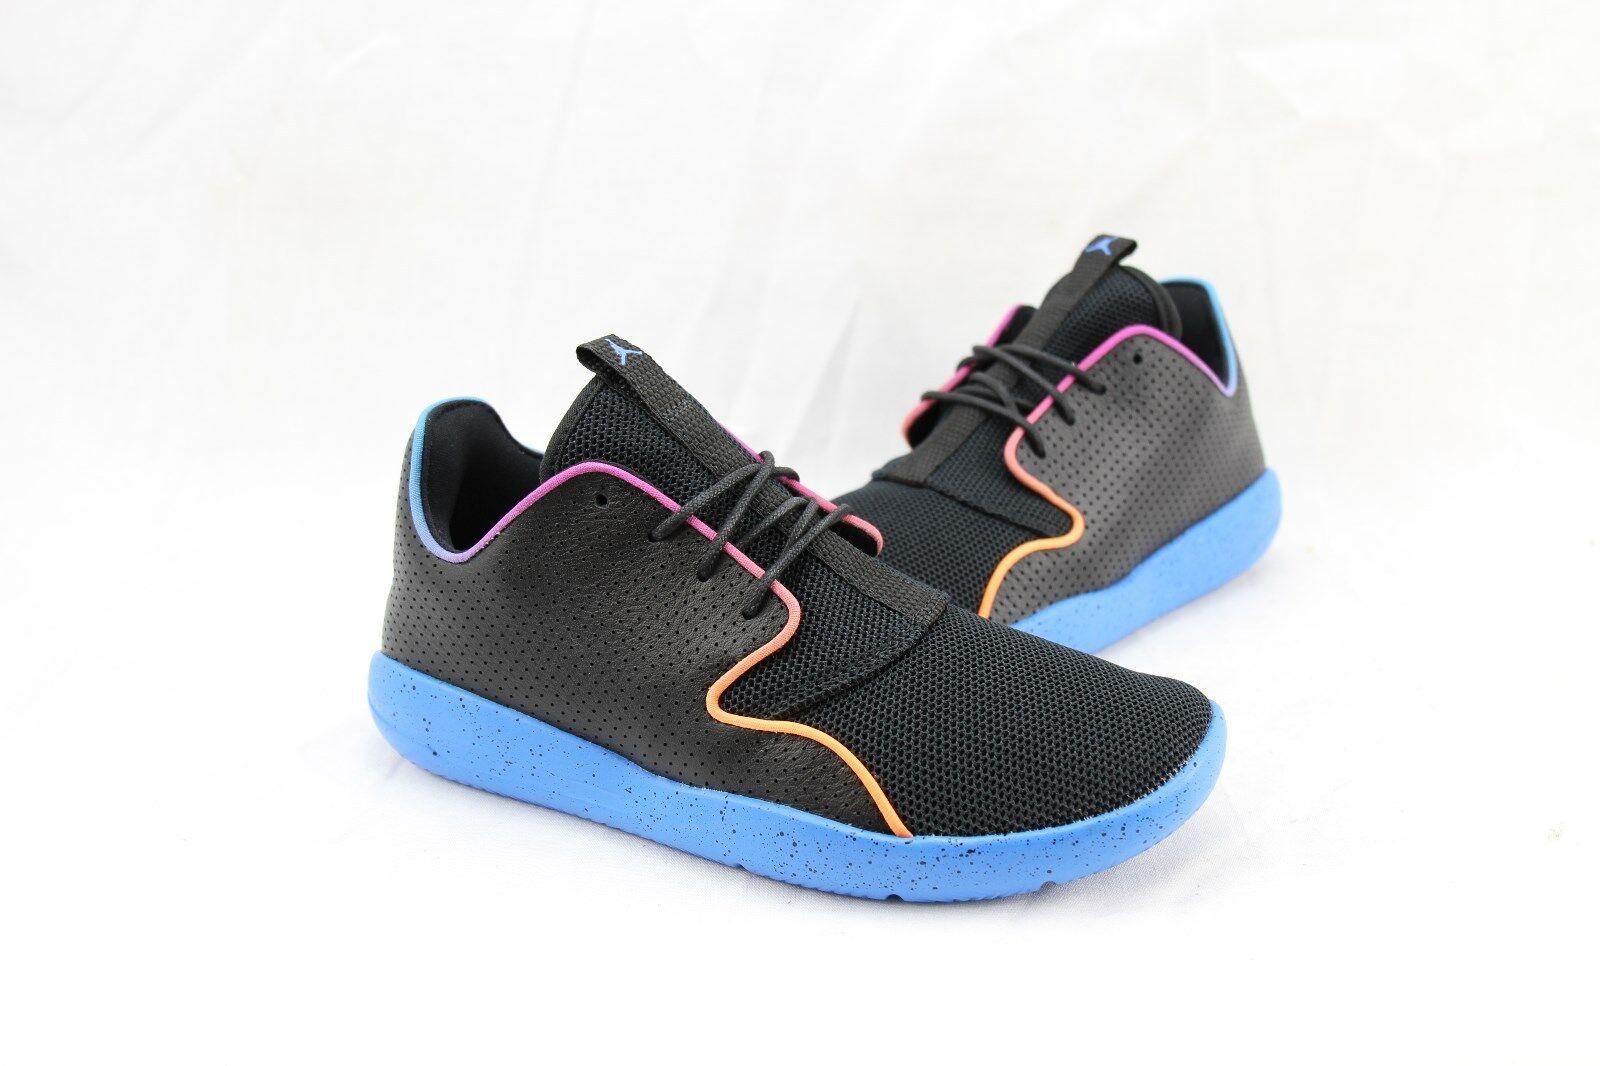 Pennino nike libera libera libera tr forma 3 - scarpa rosa marina 555158-602 scarpe femminili sz - 9 1a7c14